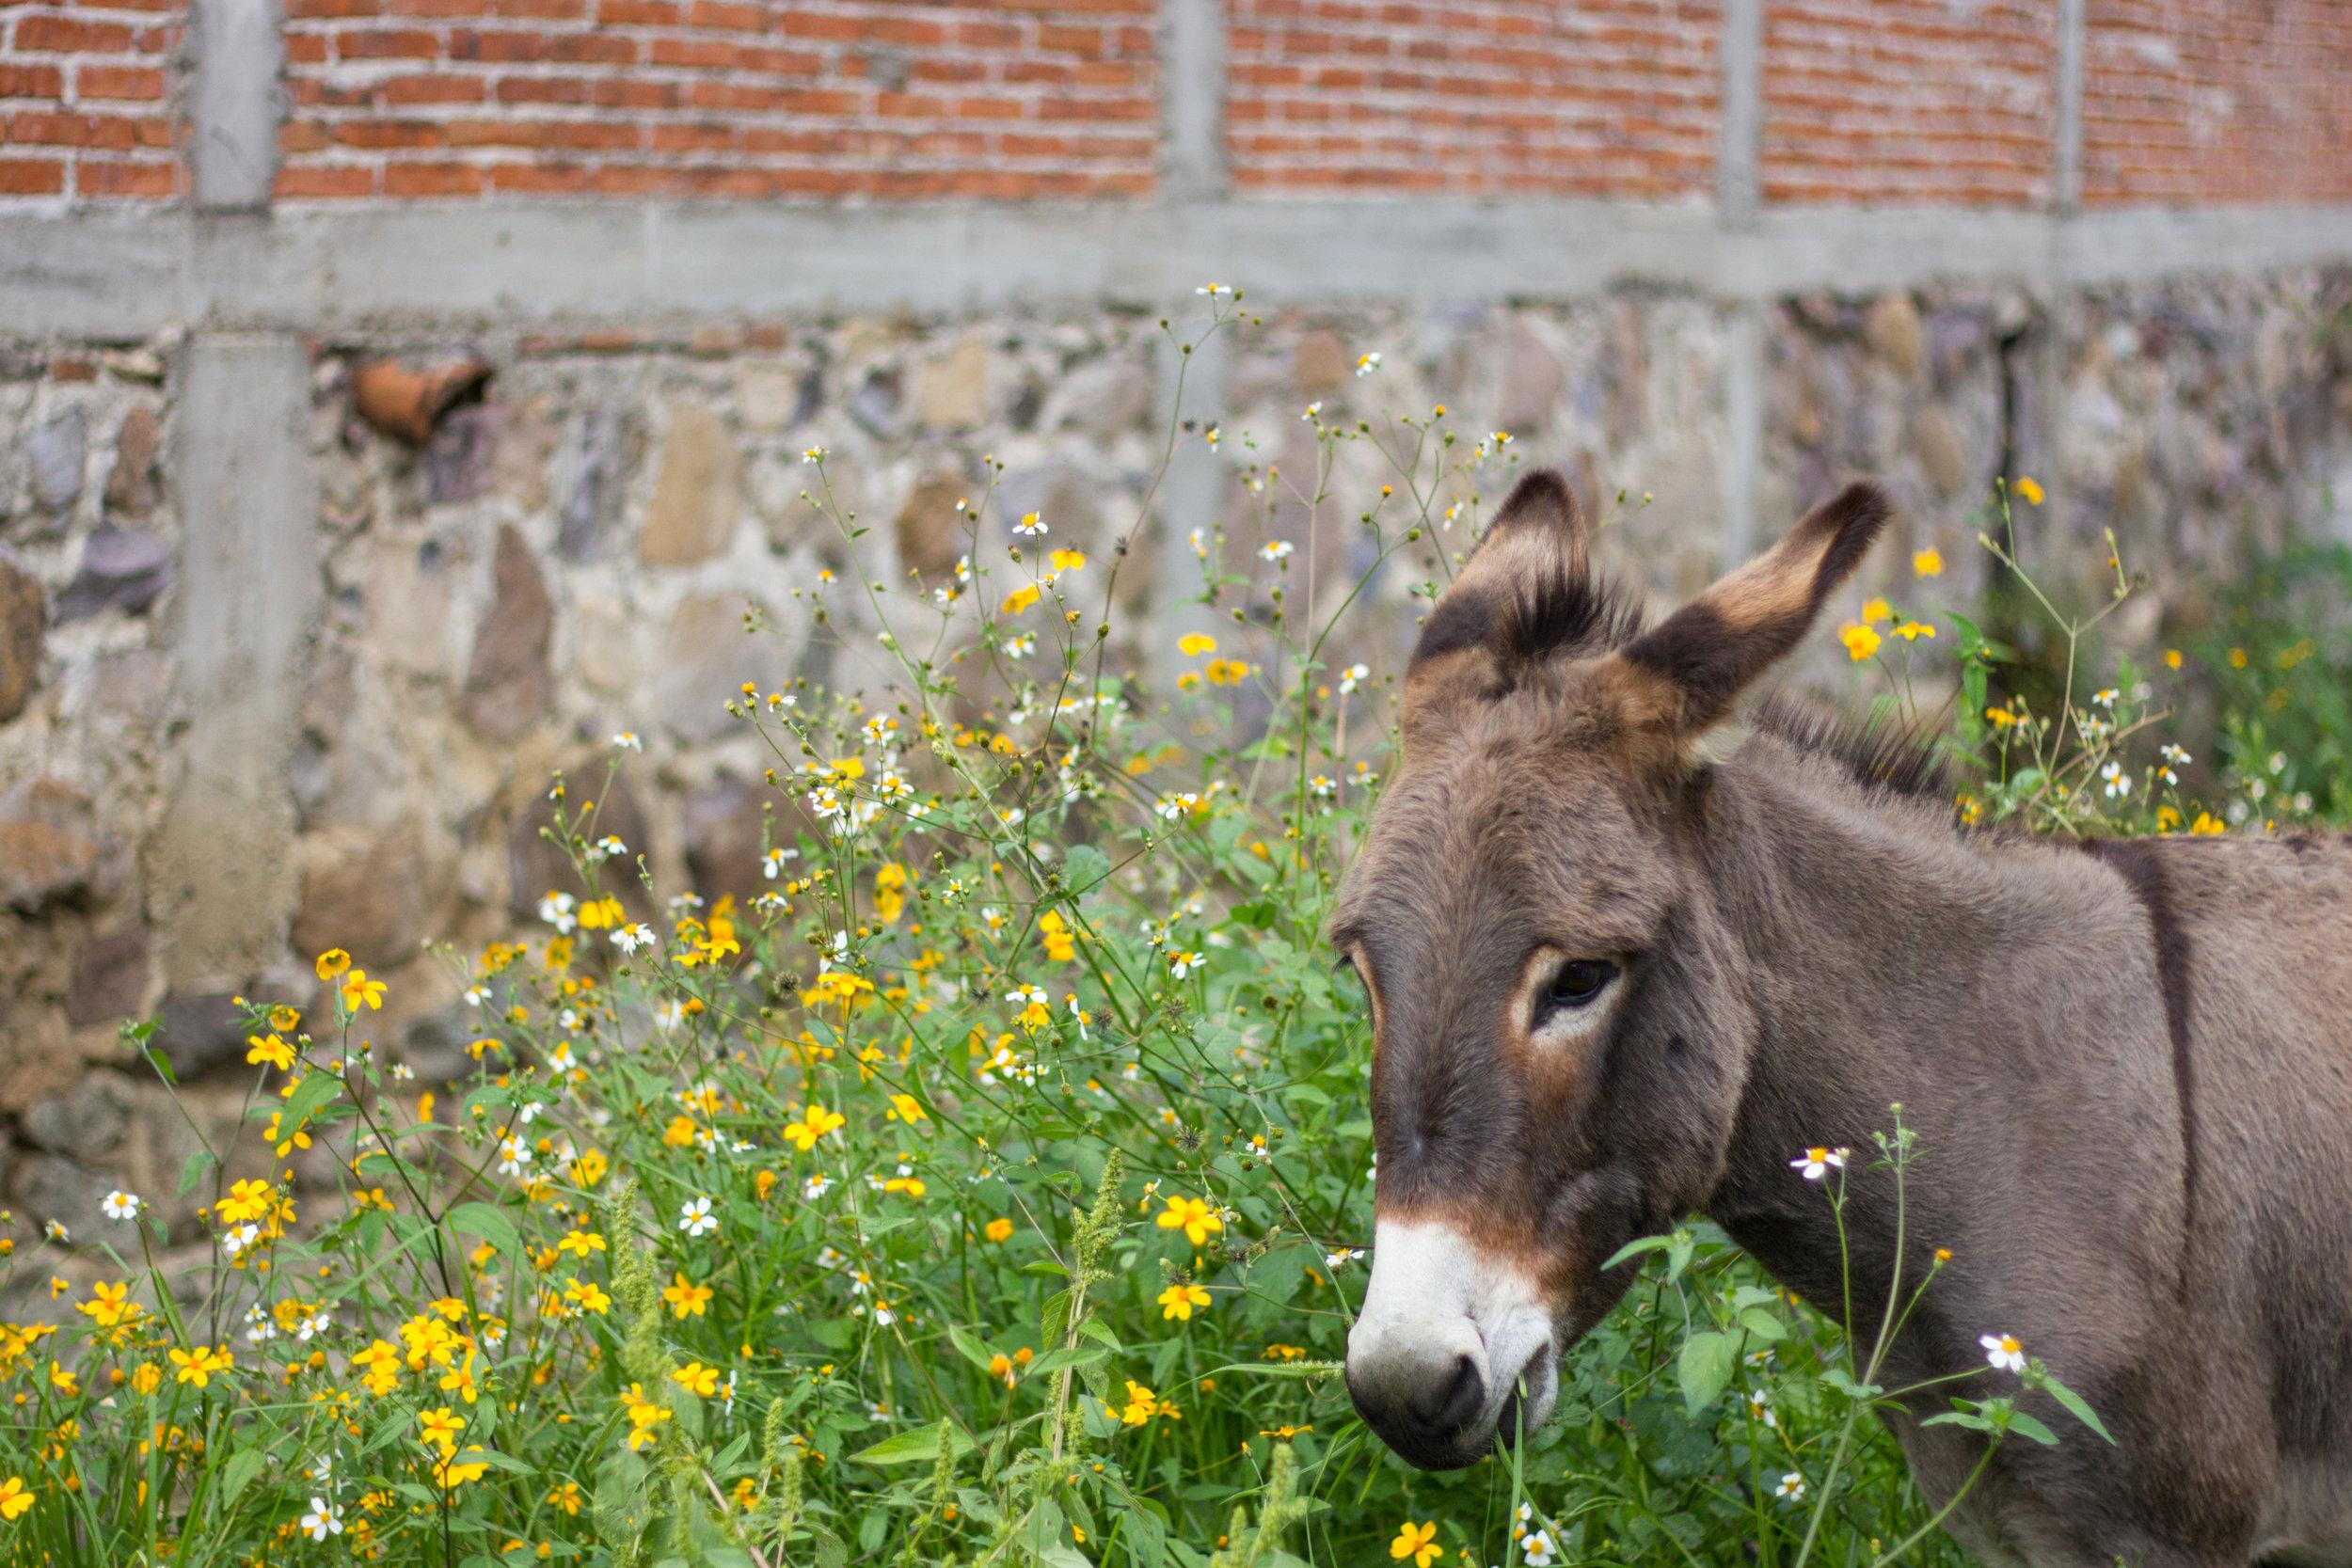 oaxaca burro by leah pellegrini for thread caravan.jpg